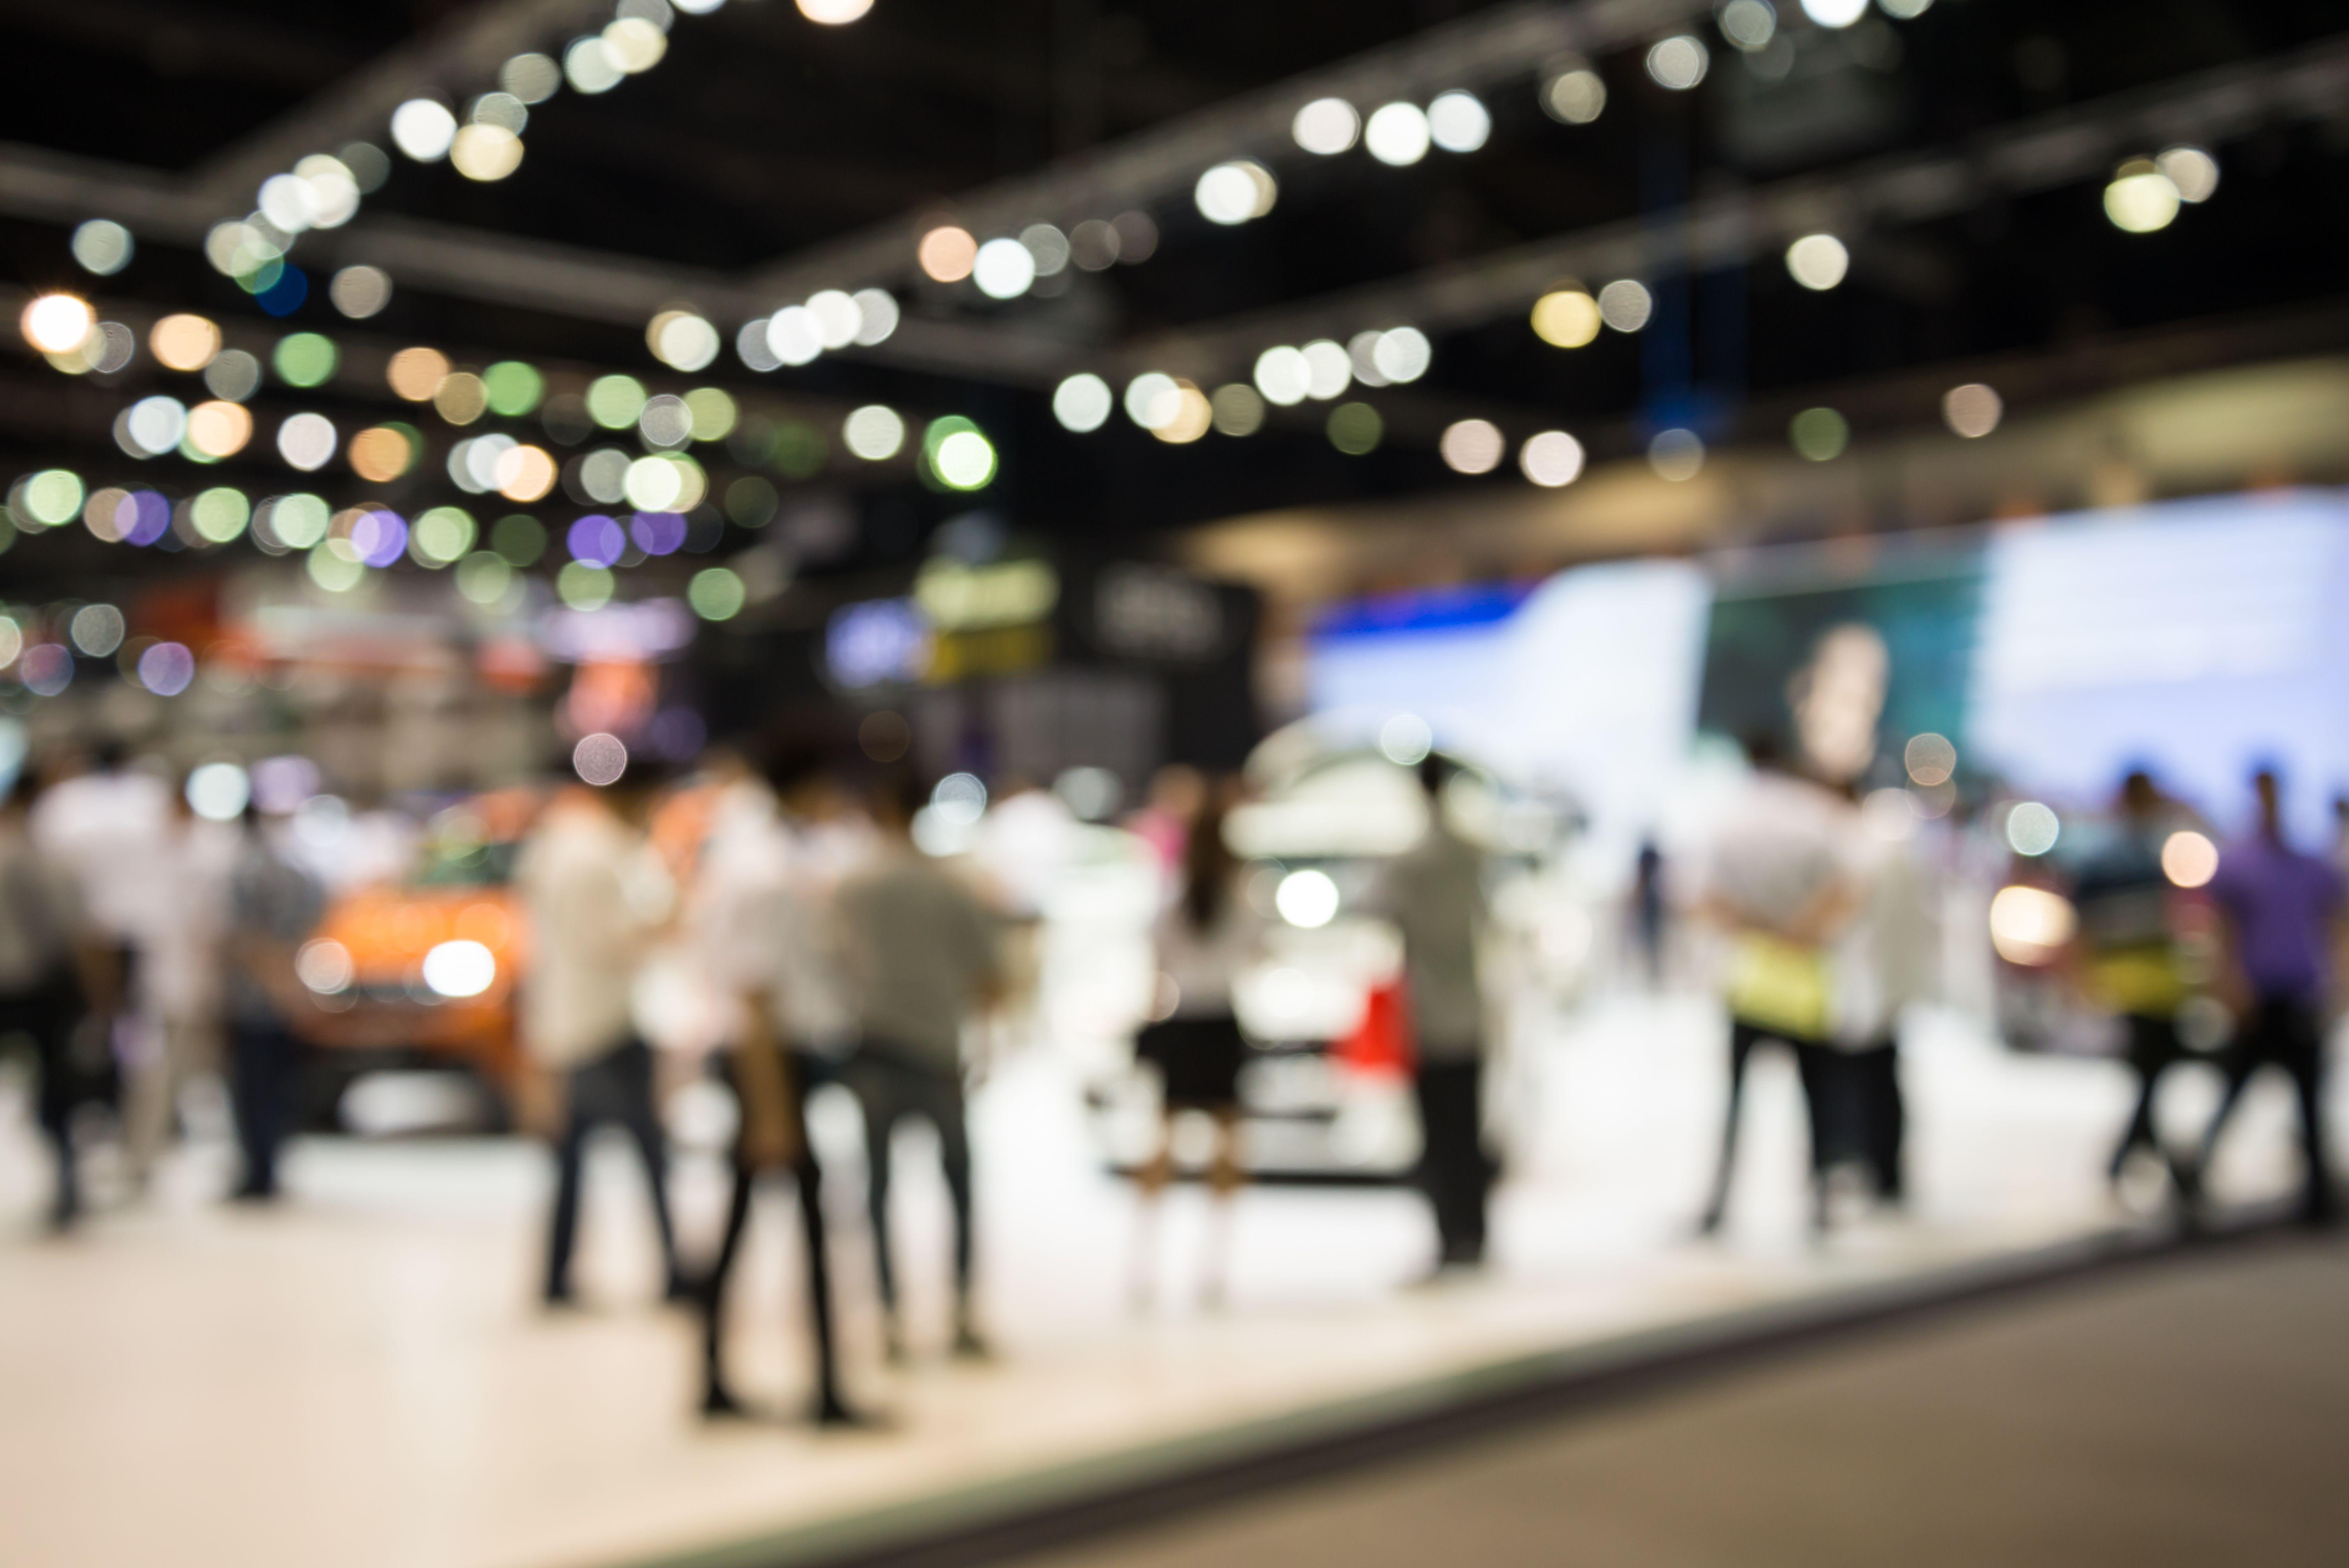 Ljubljana To Host A Major Carshow Auto Salon KONGRES - Major car shows